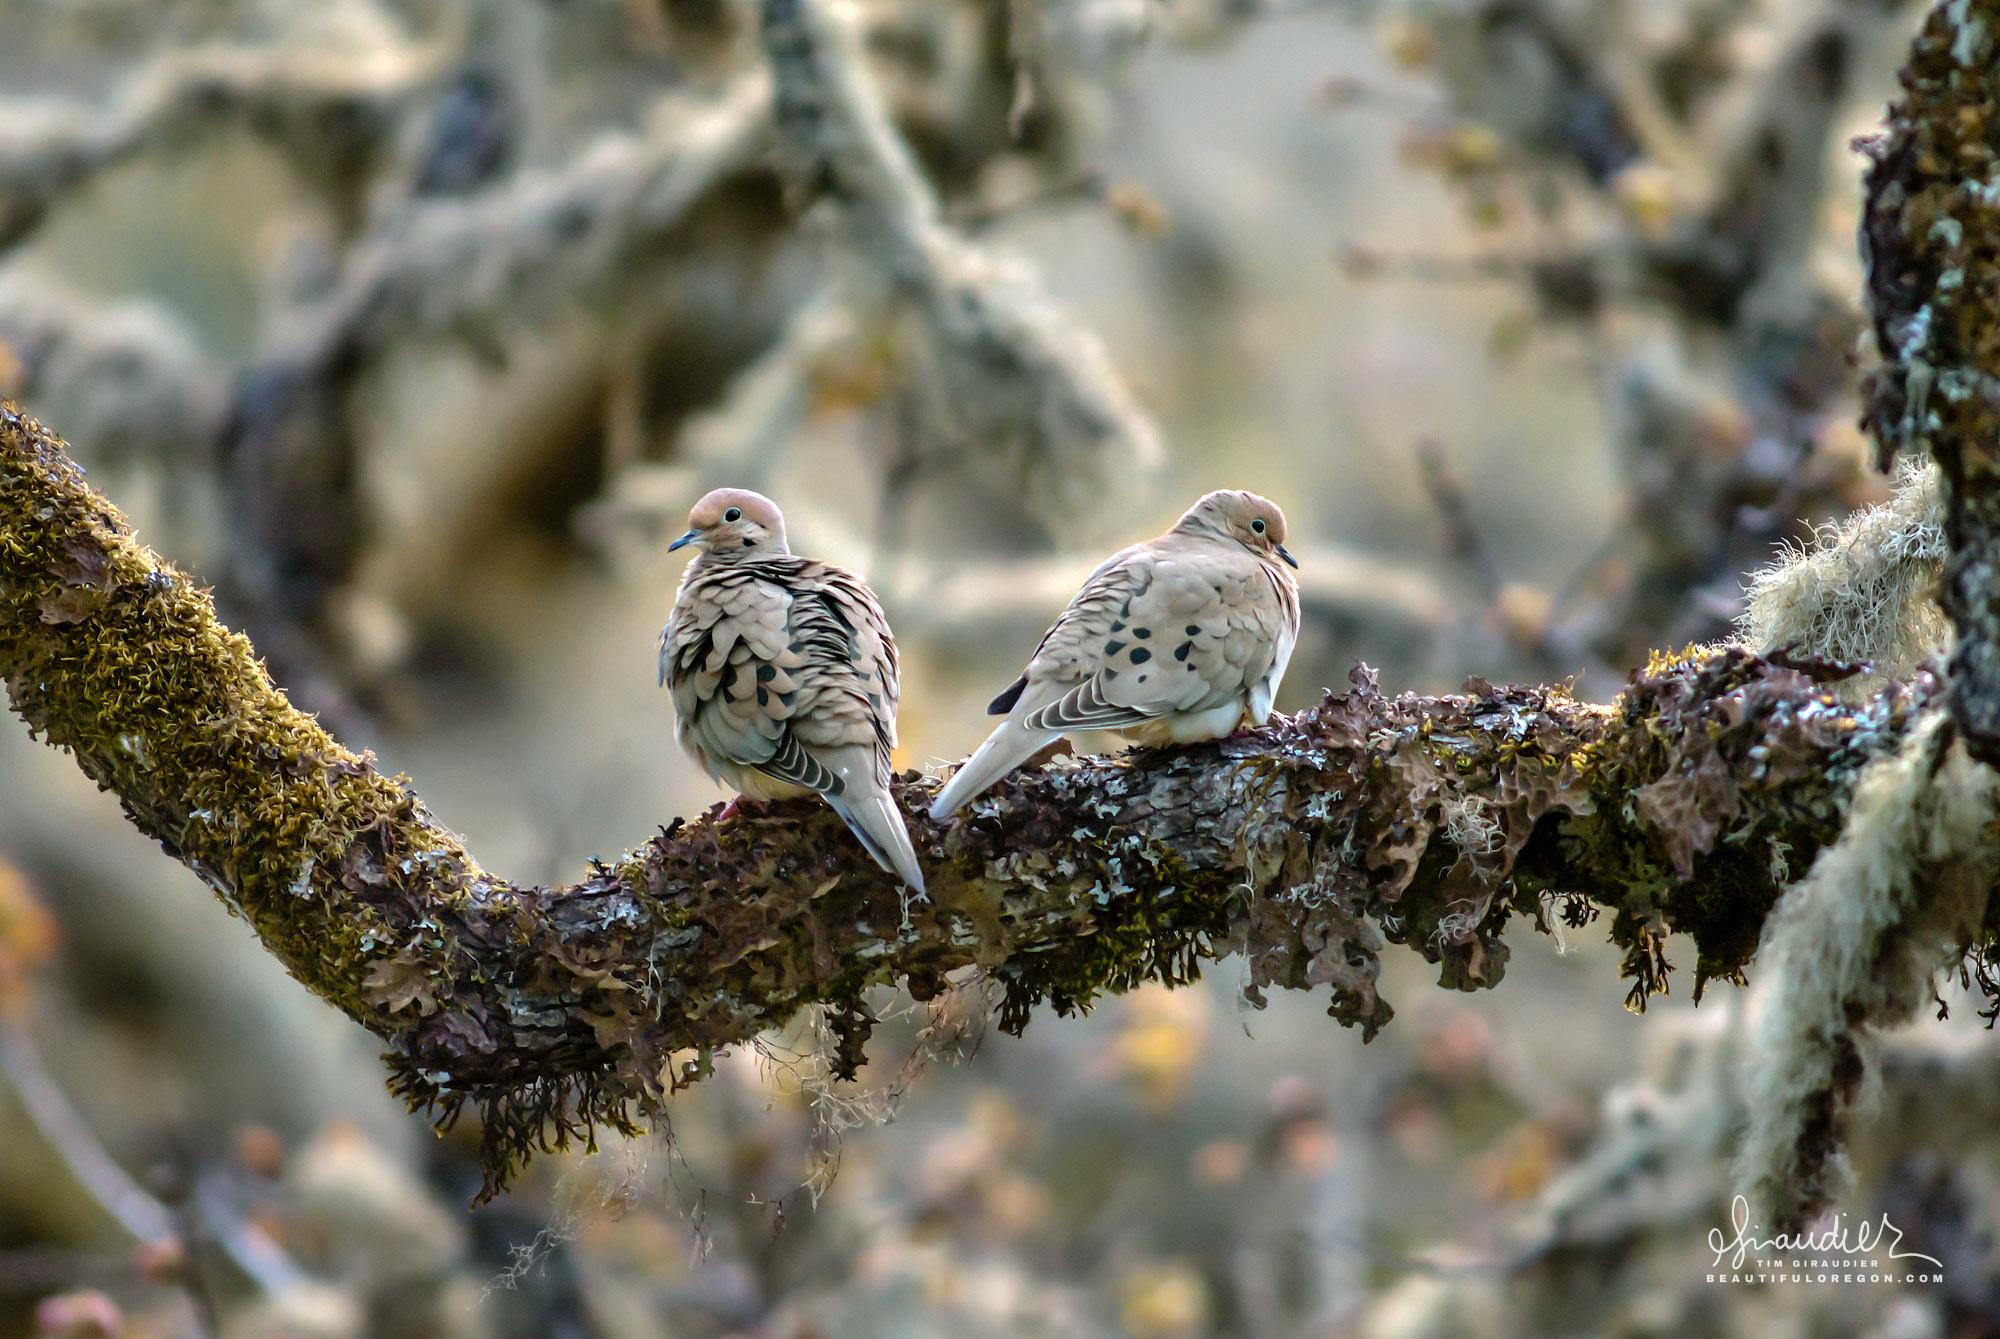 A pair of Mourning Doves (Zenaida macroura) shelters amidst the bramble of White Oak at Mount Pisgah Arboretum, Willamette Valley, Oregon.